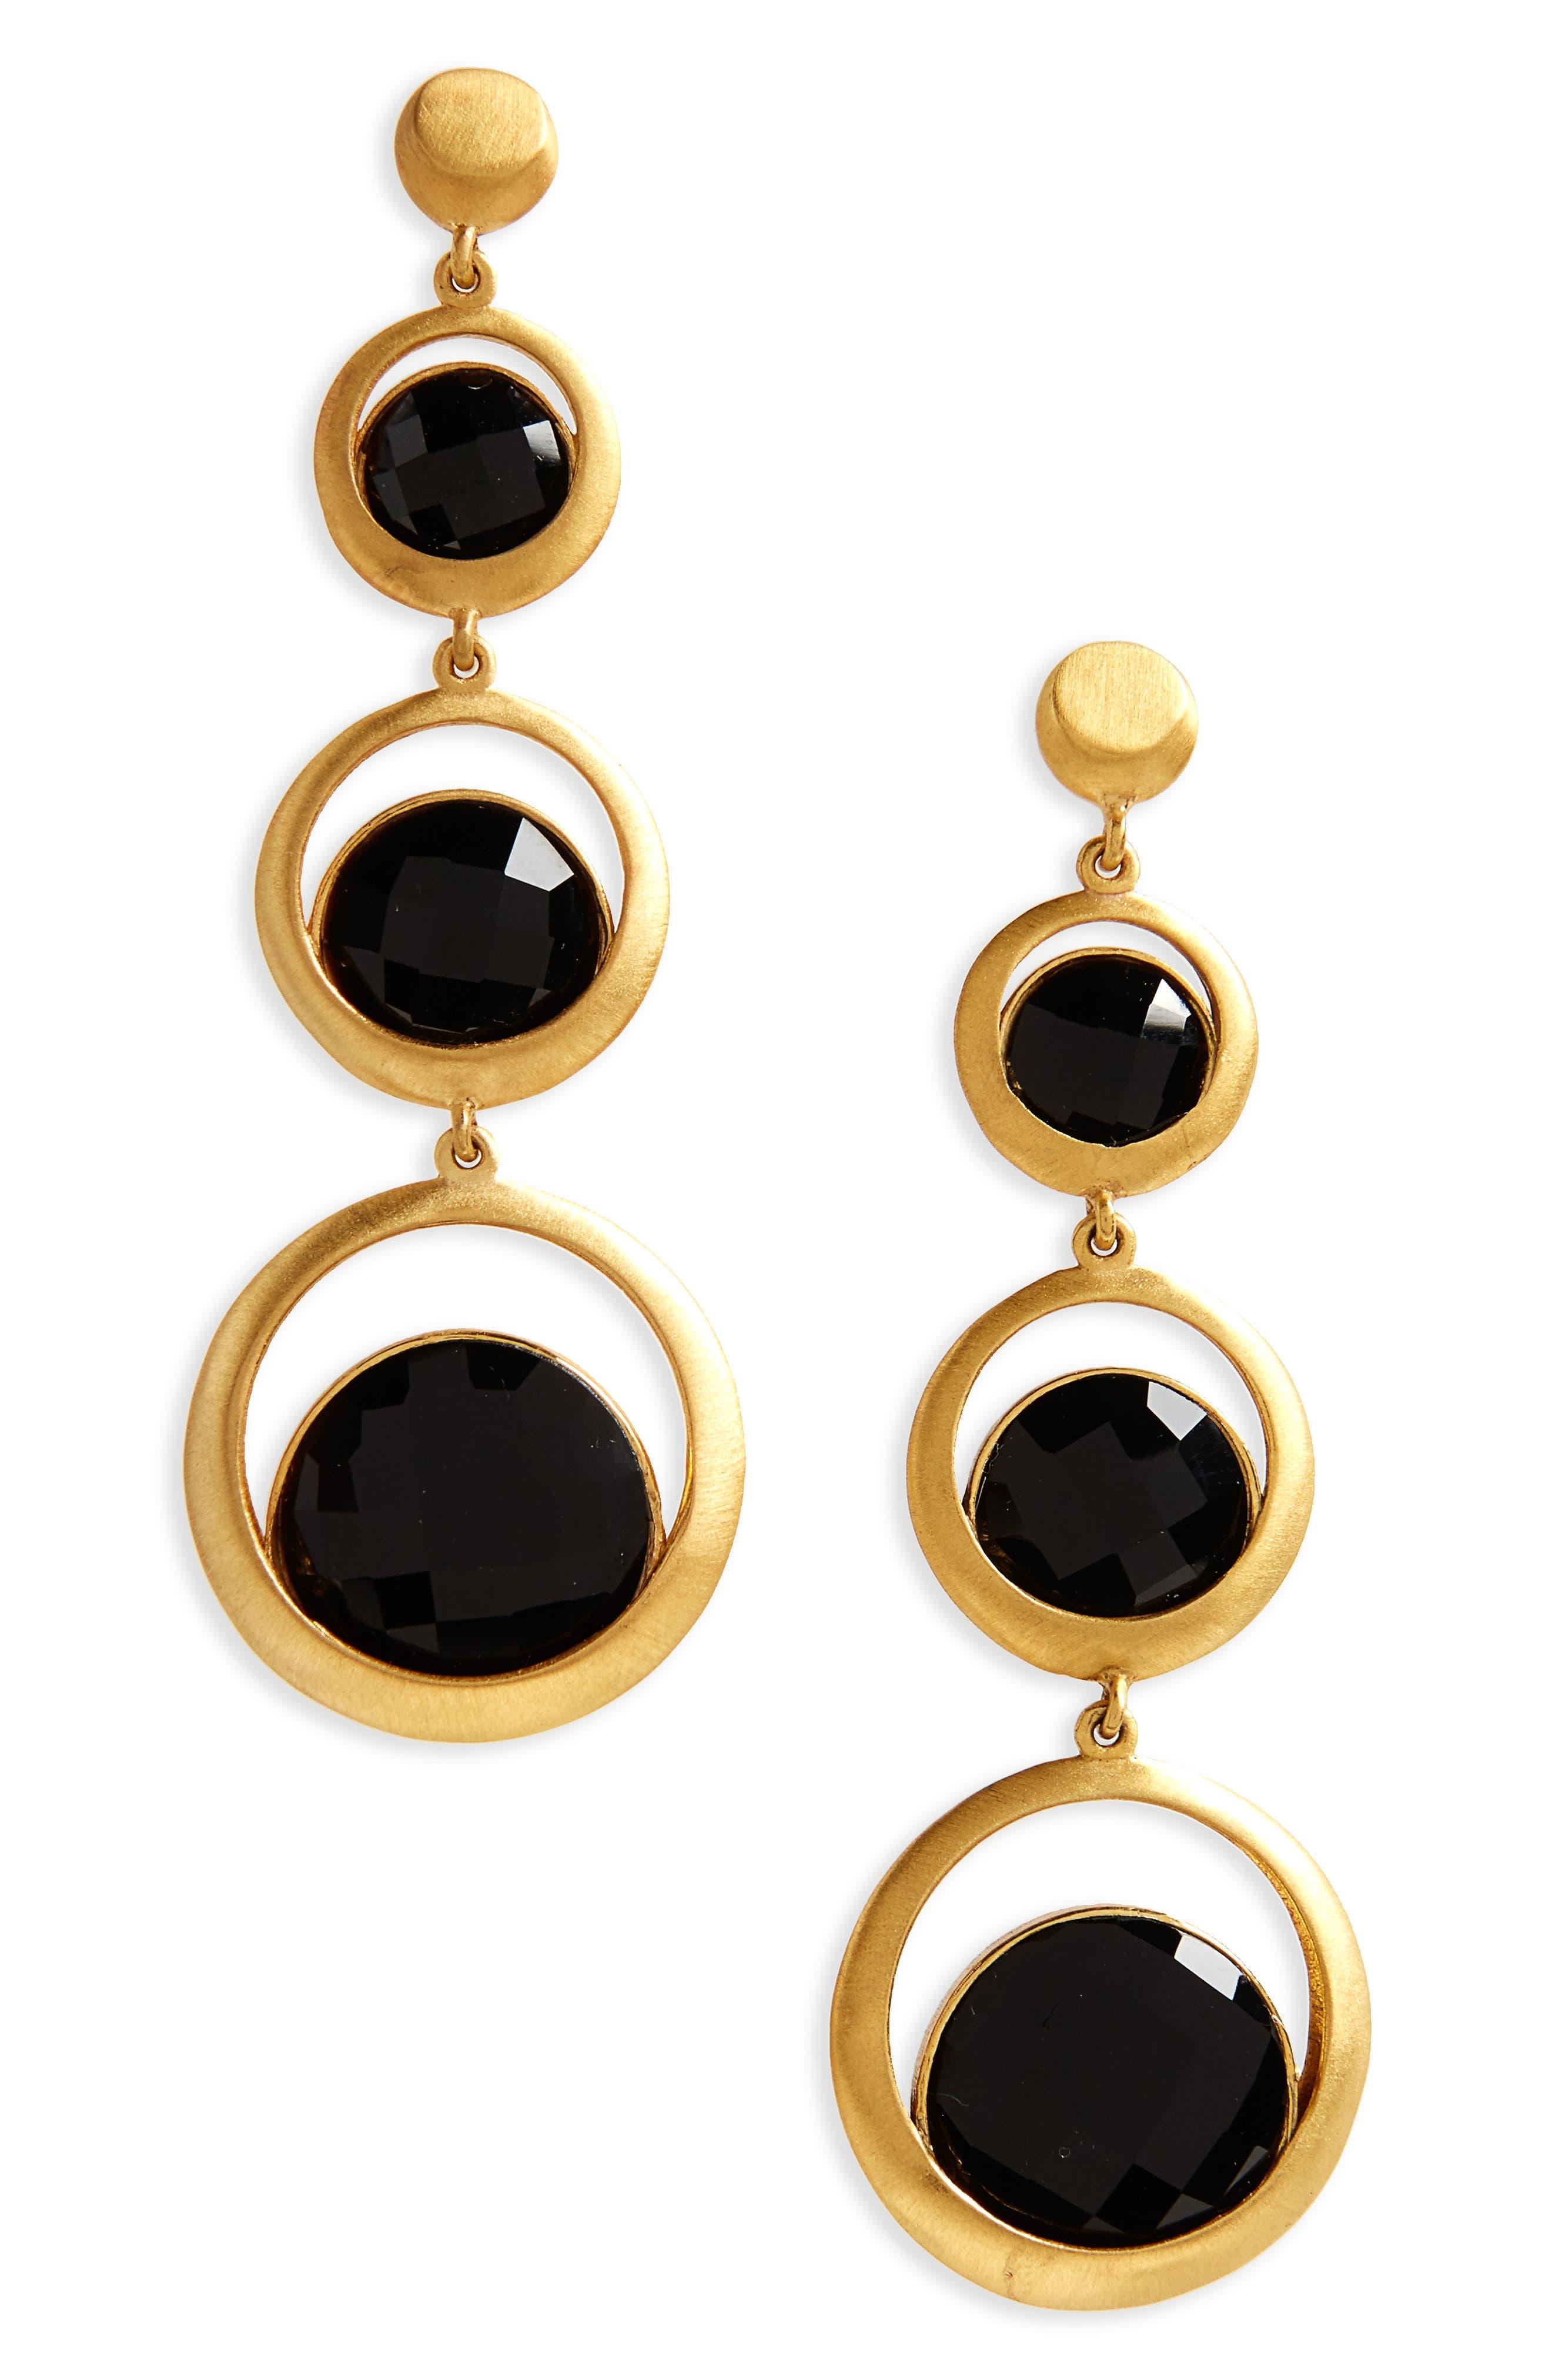 Triple Semiprecious Stone Drop Earrings,                             Main thumbnail 1, color,                             Black Onyx/ Gold